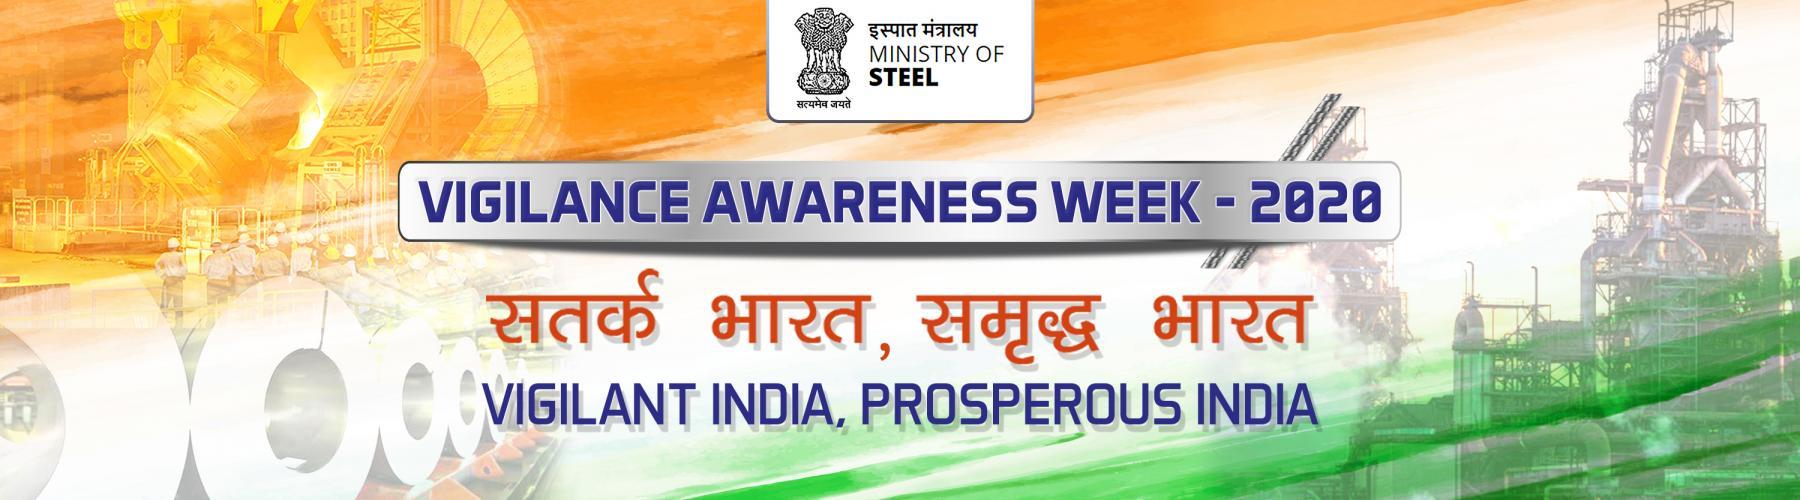 Vigilance Awareness Week 2020